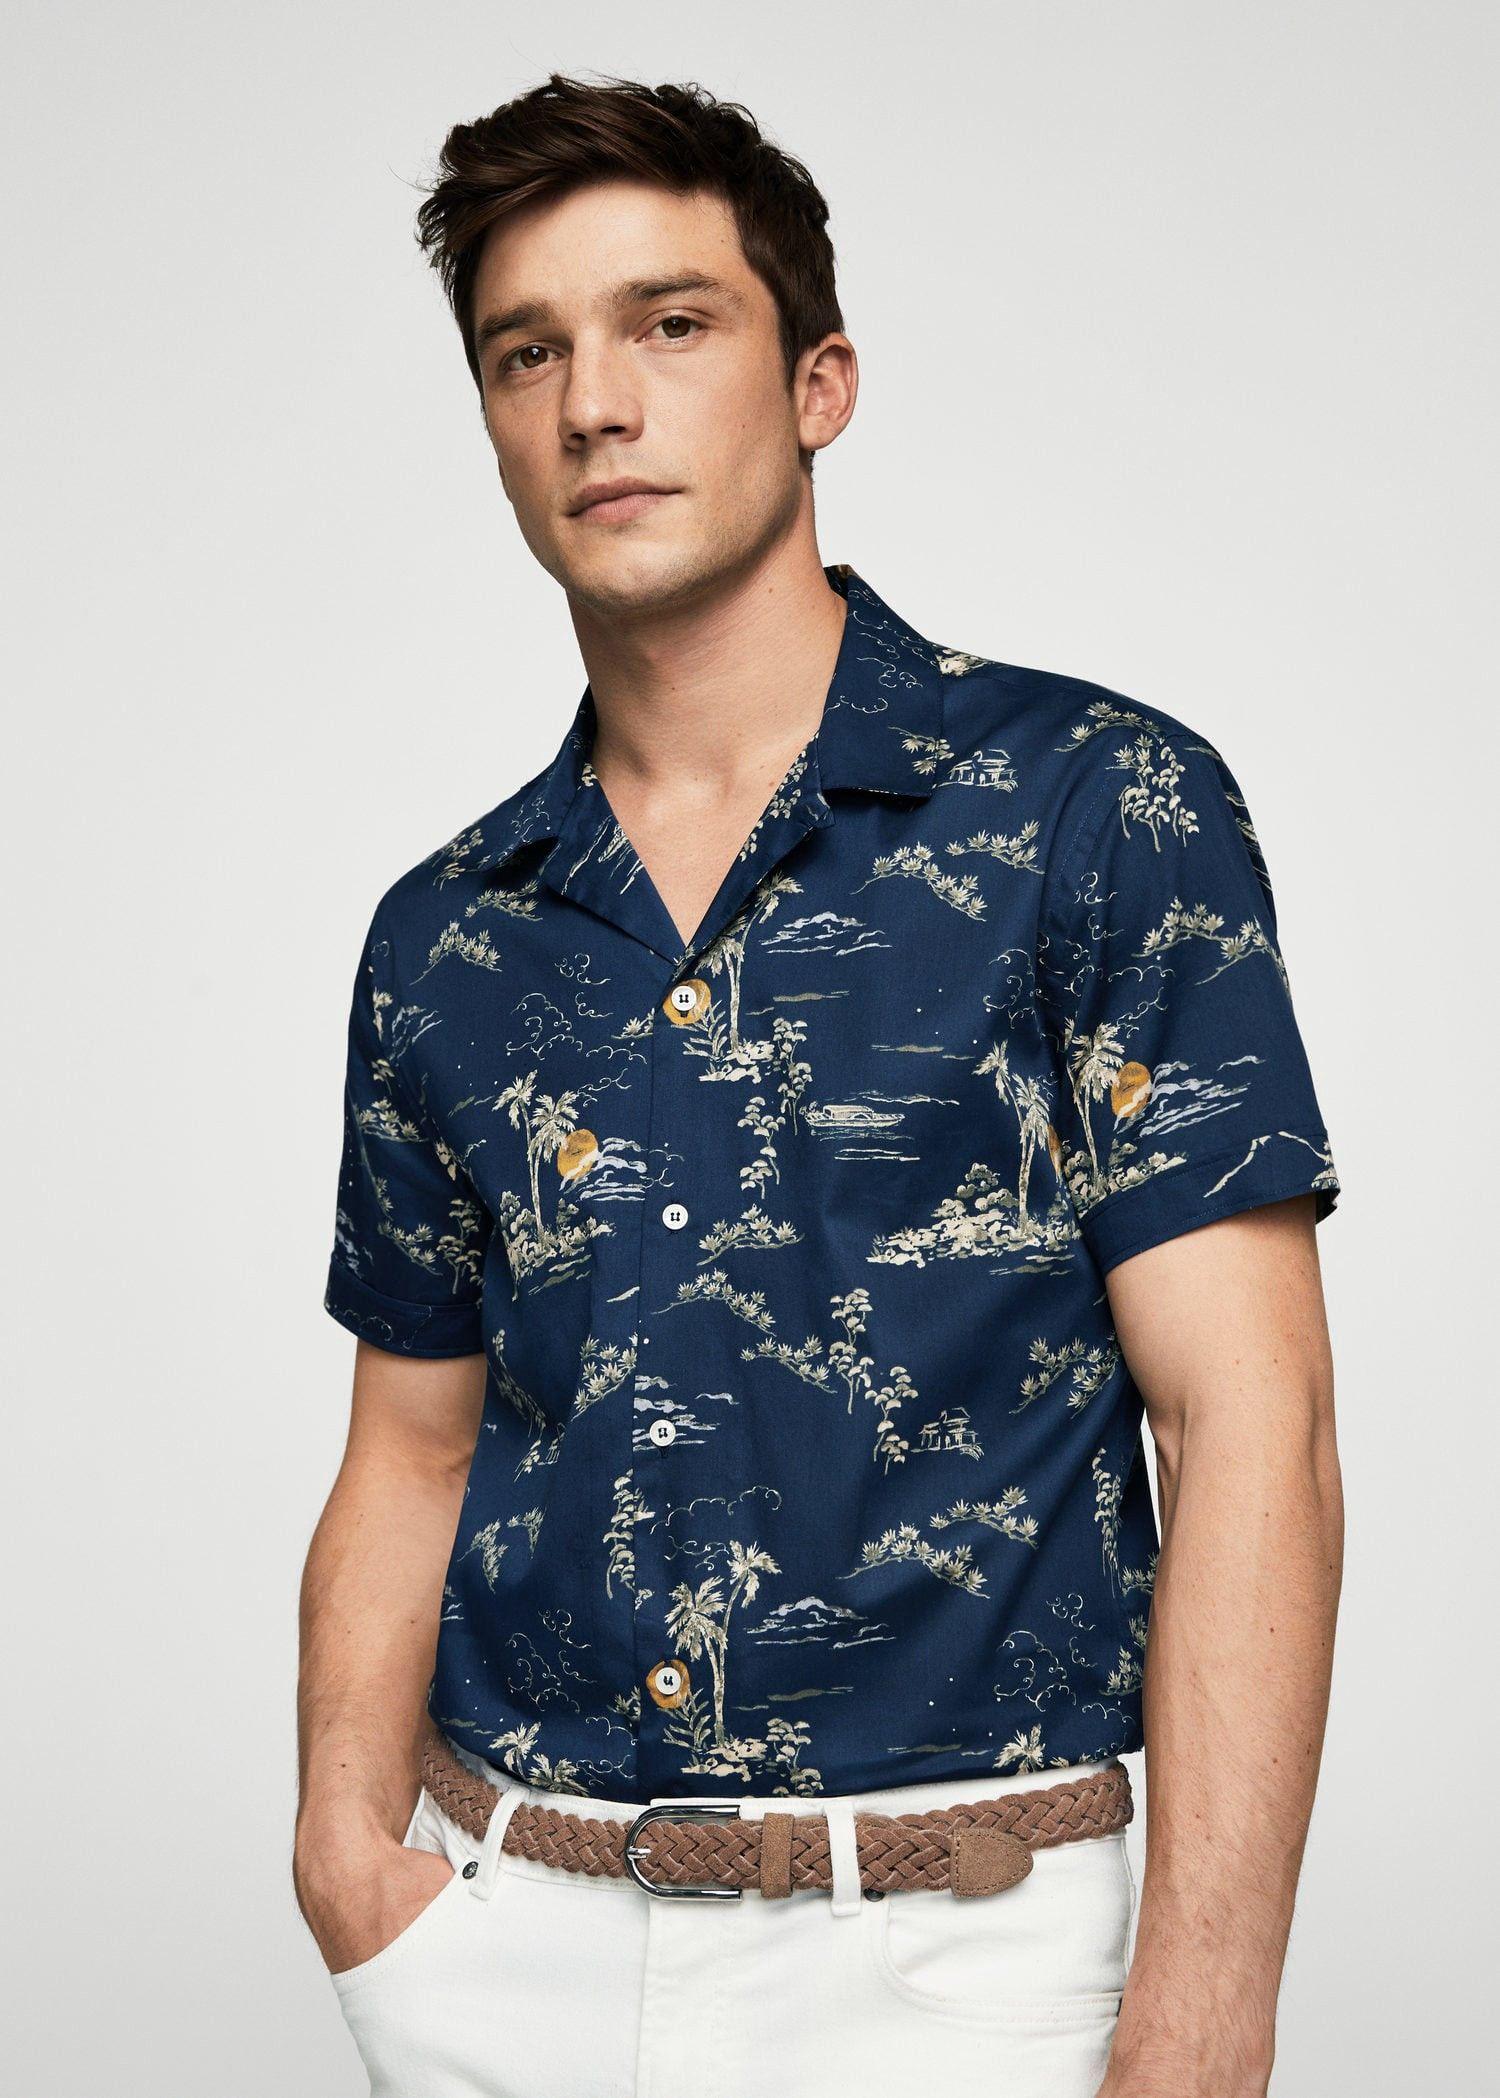 61312ab4a8 Mango Regular-Fit Tropical Print Shirt - Men